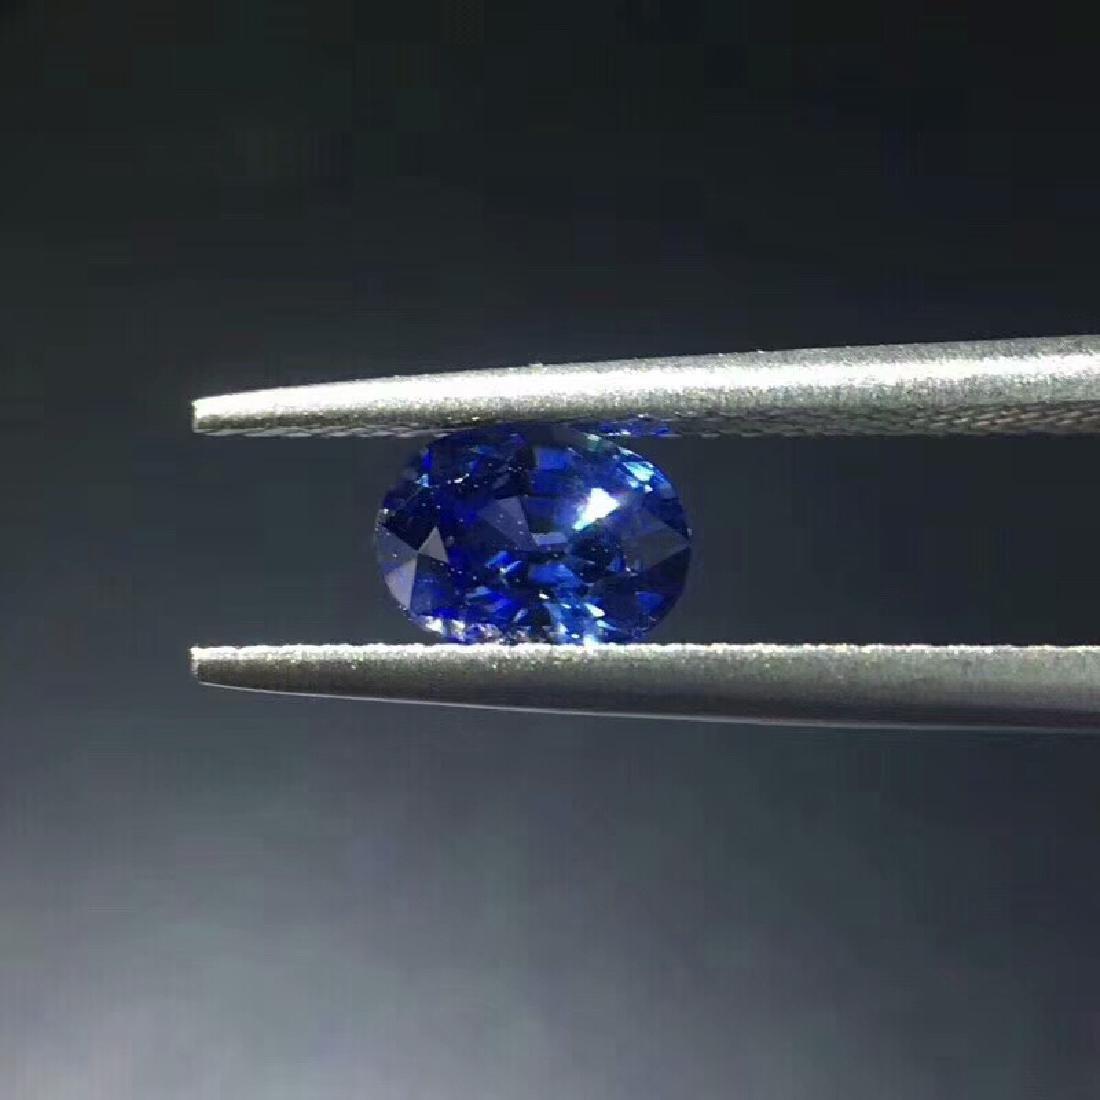 1.02 ct Sapphire 4.8*6.5*3.7 mm Oval Cut